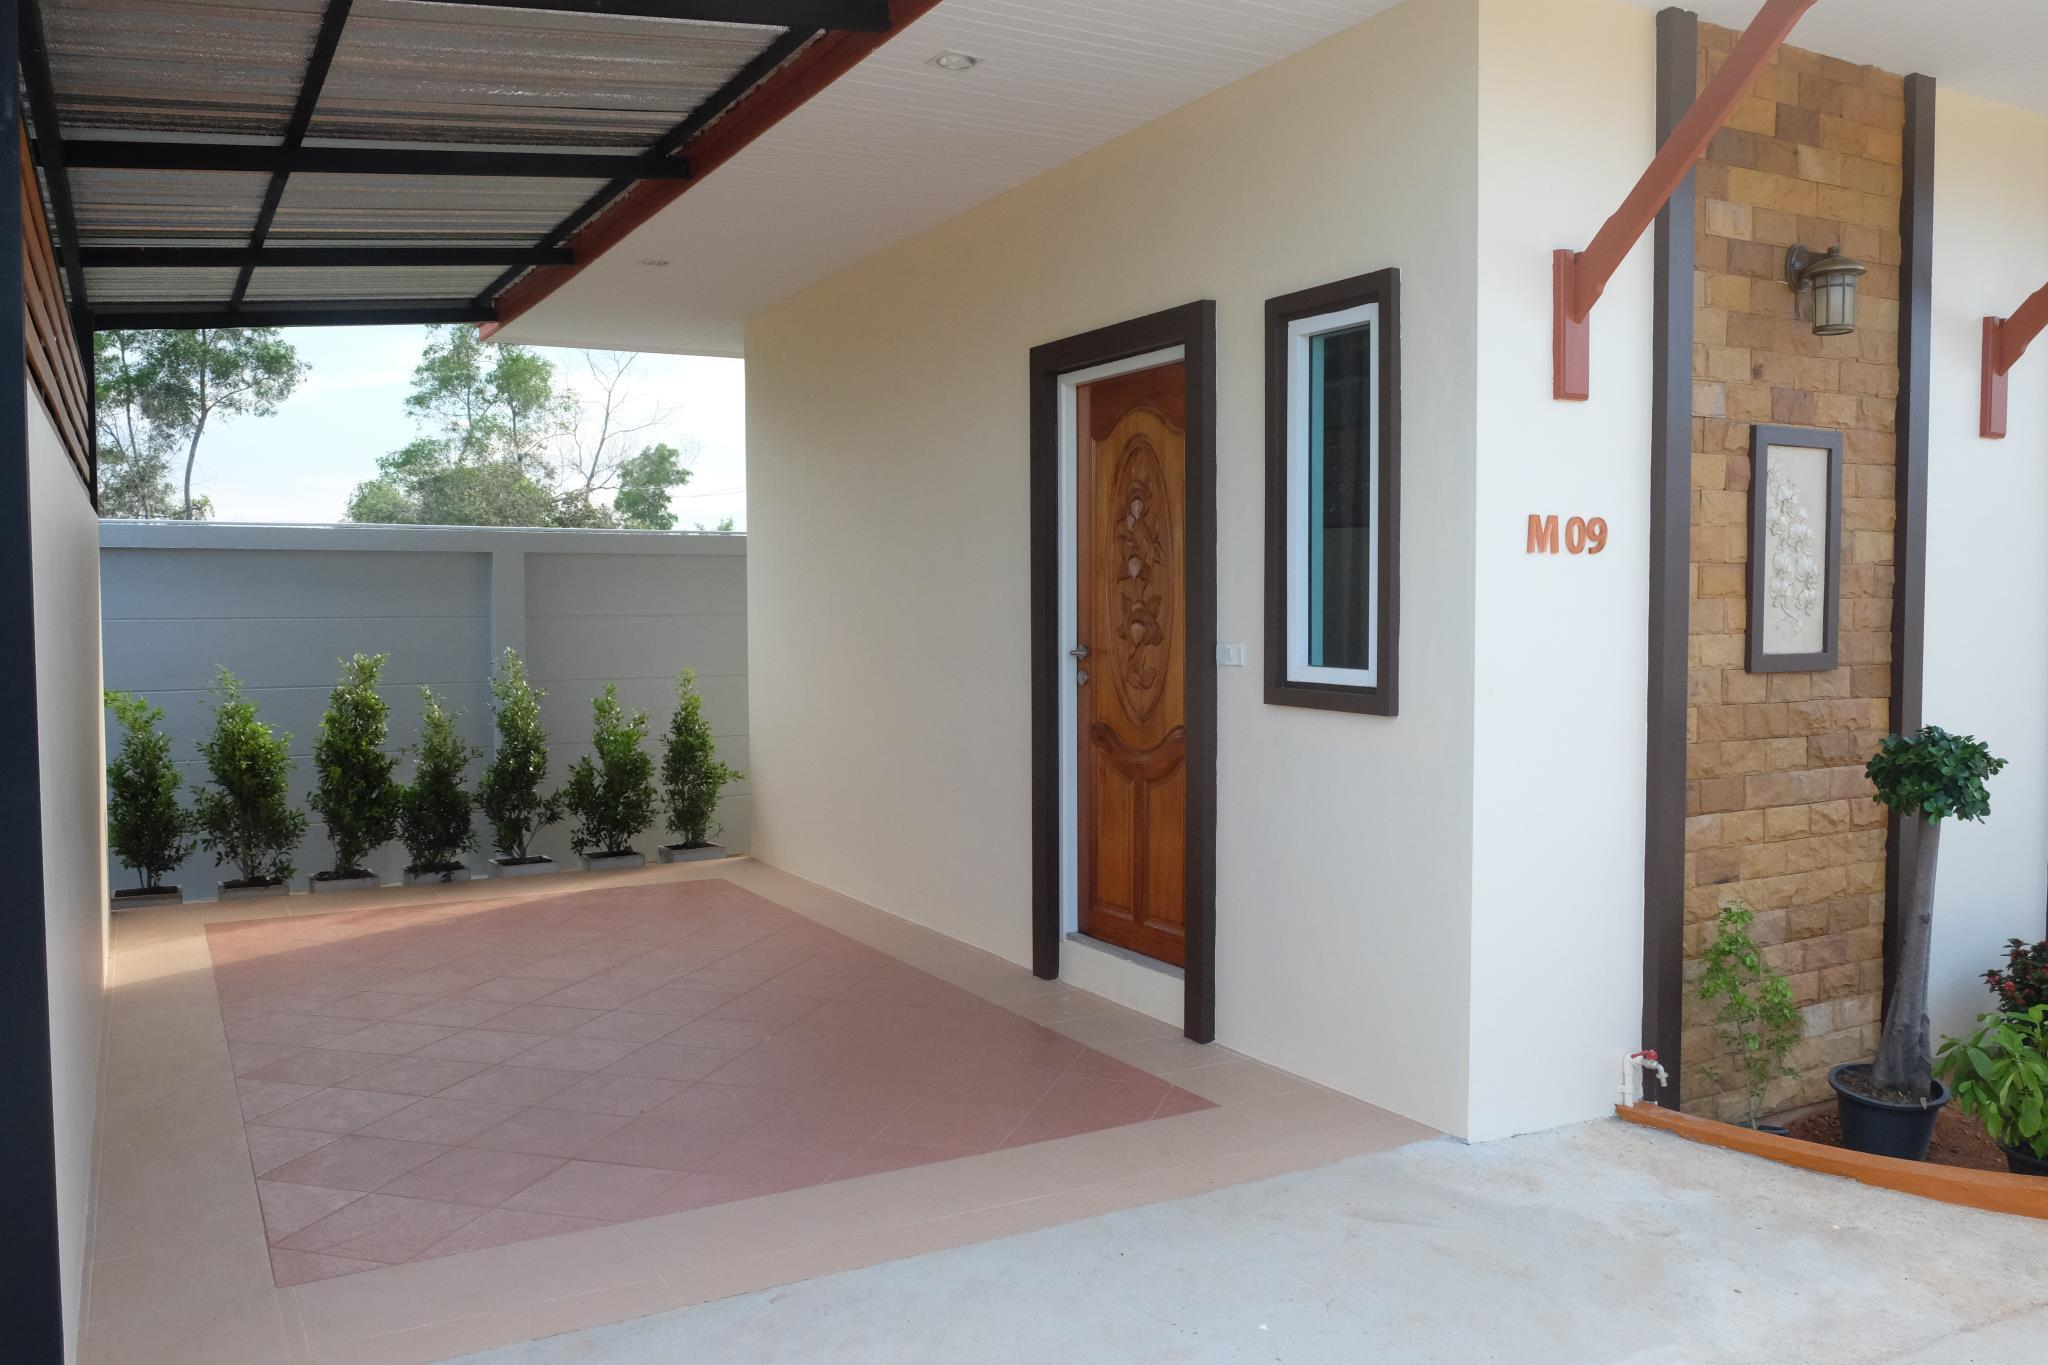 Mantra resort,Mantra resort